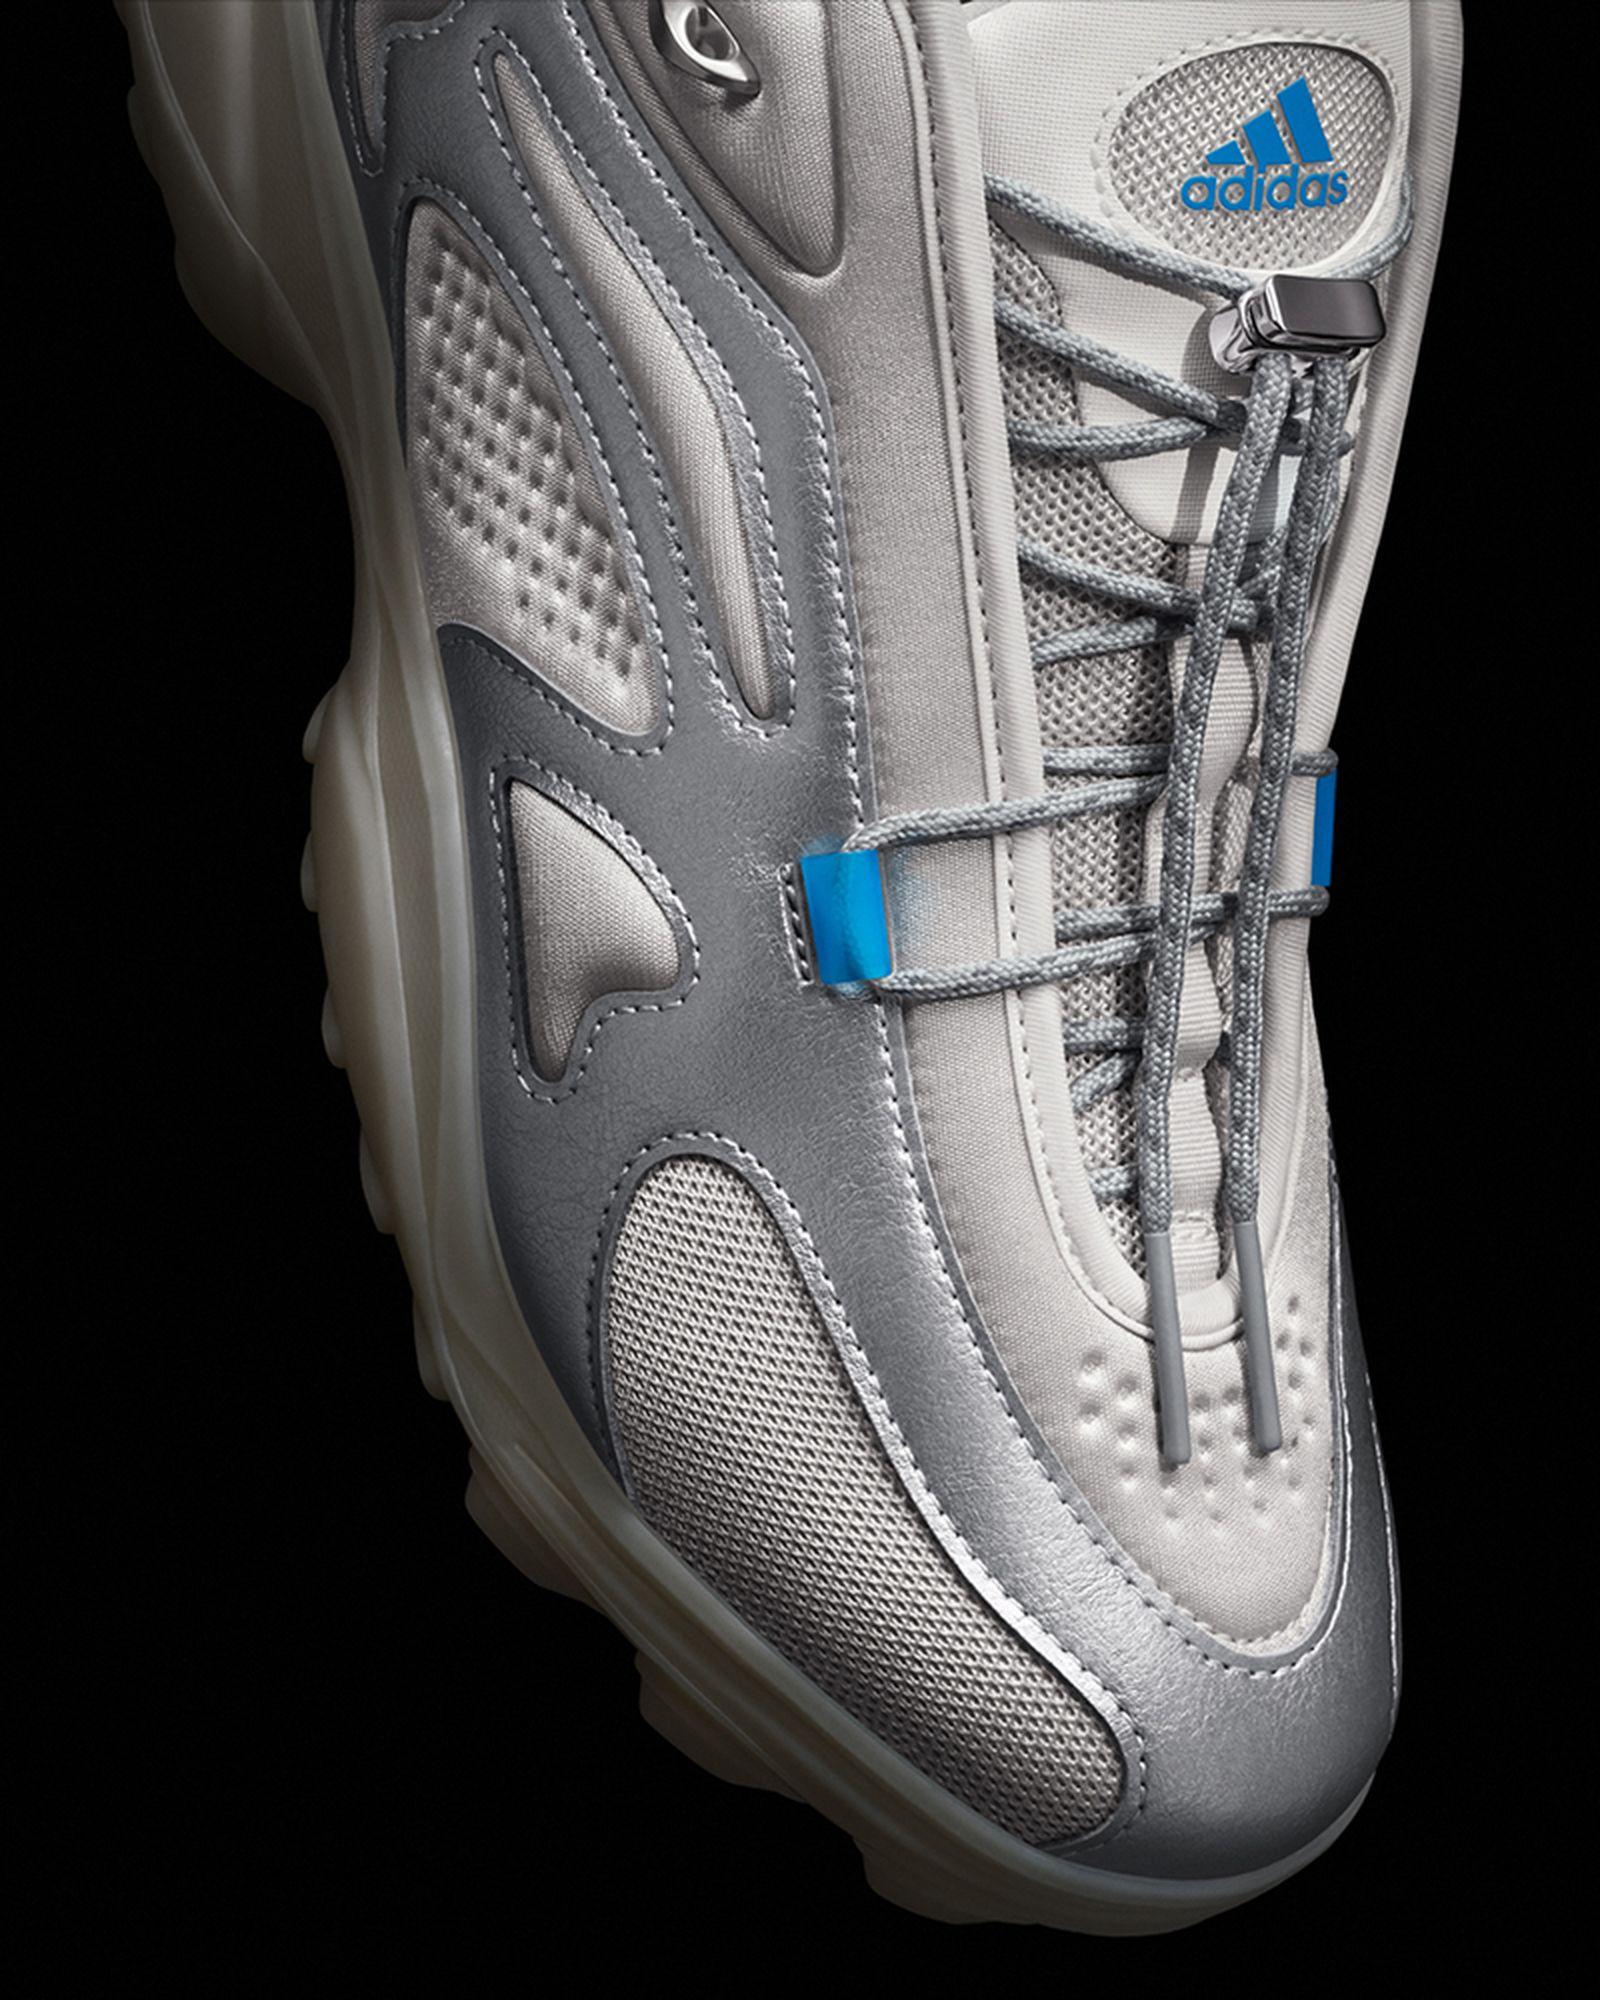 032c-adidas-04